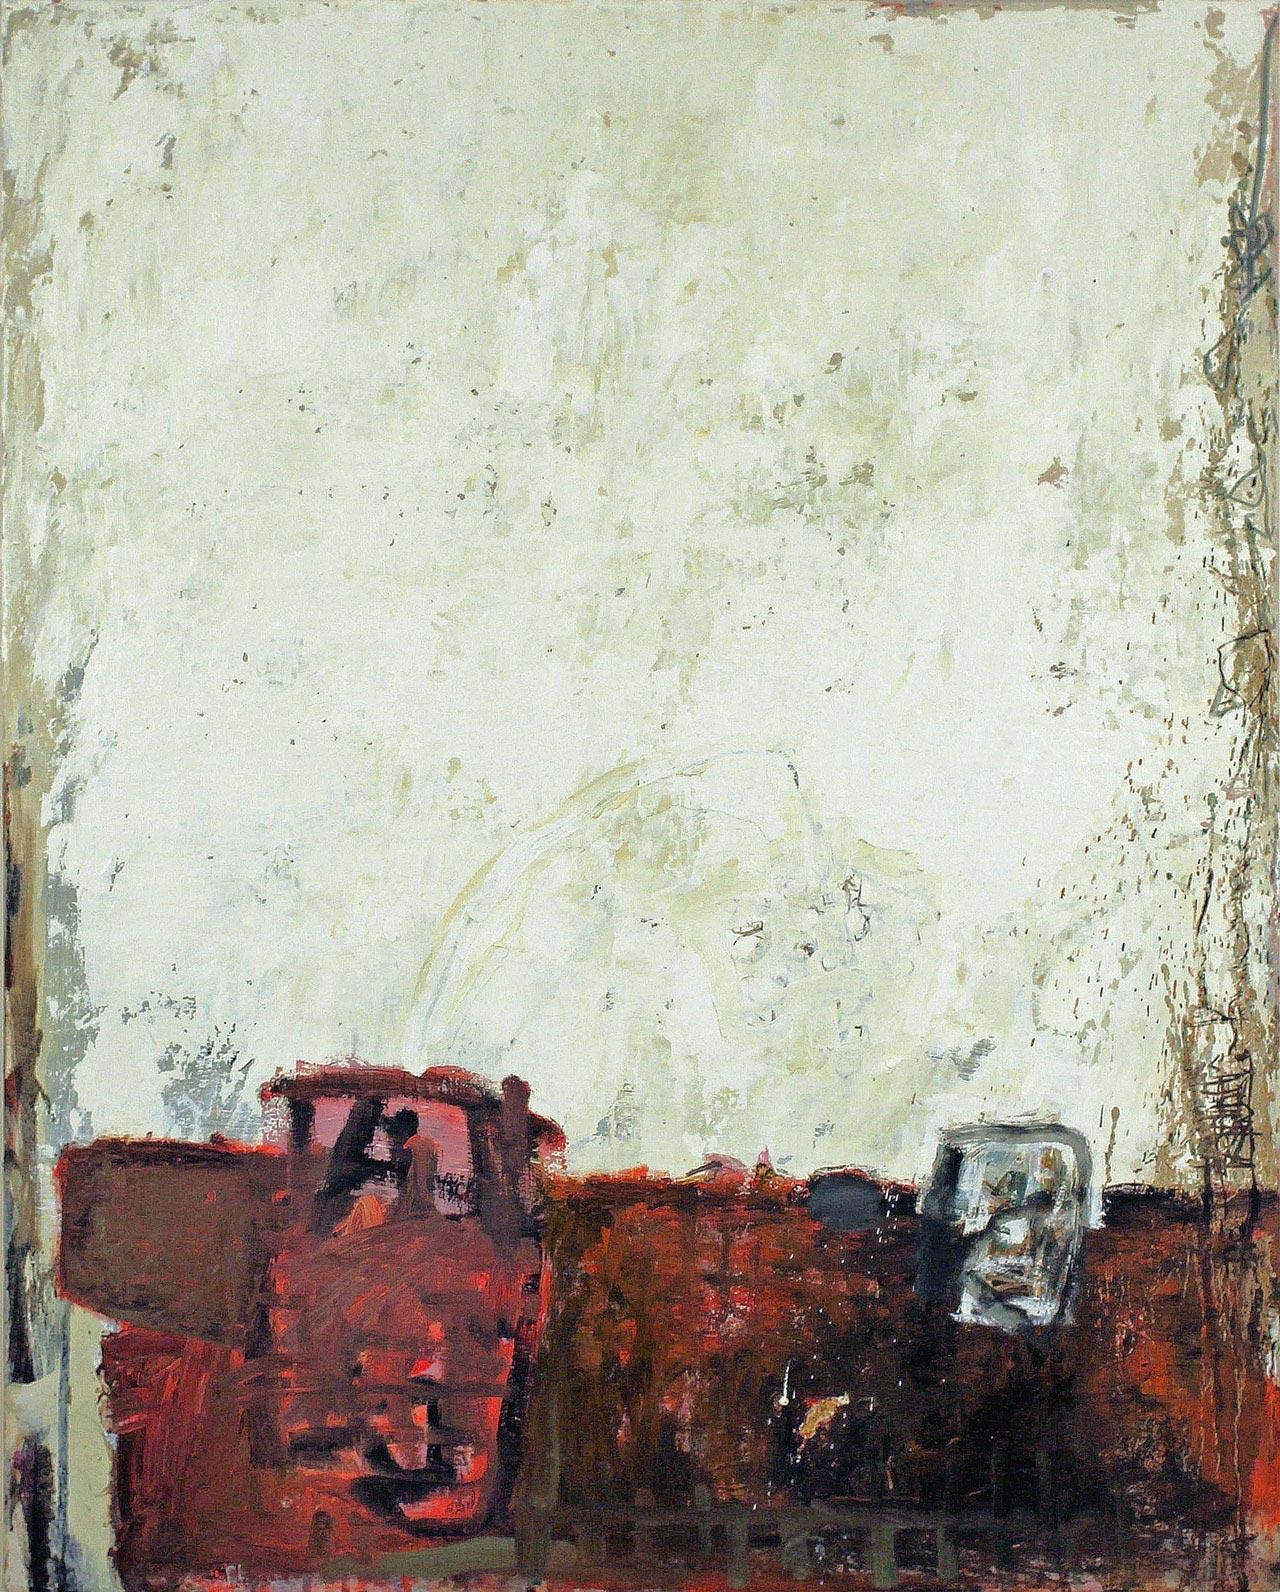 Melinda Stickney Gibson Elena Zang Gallery